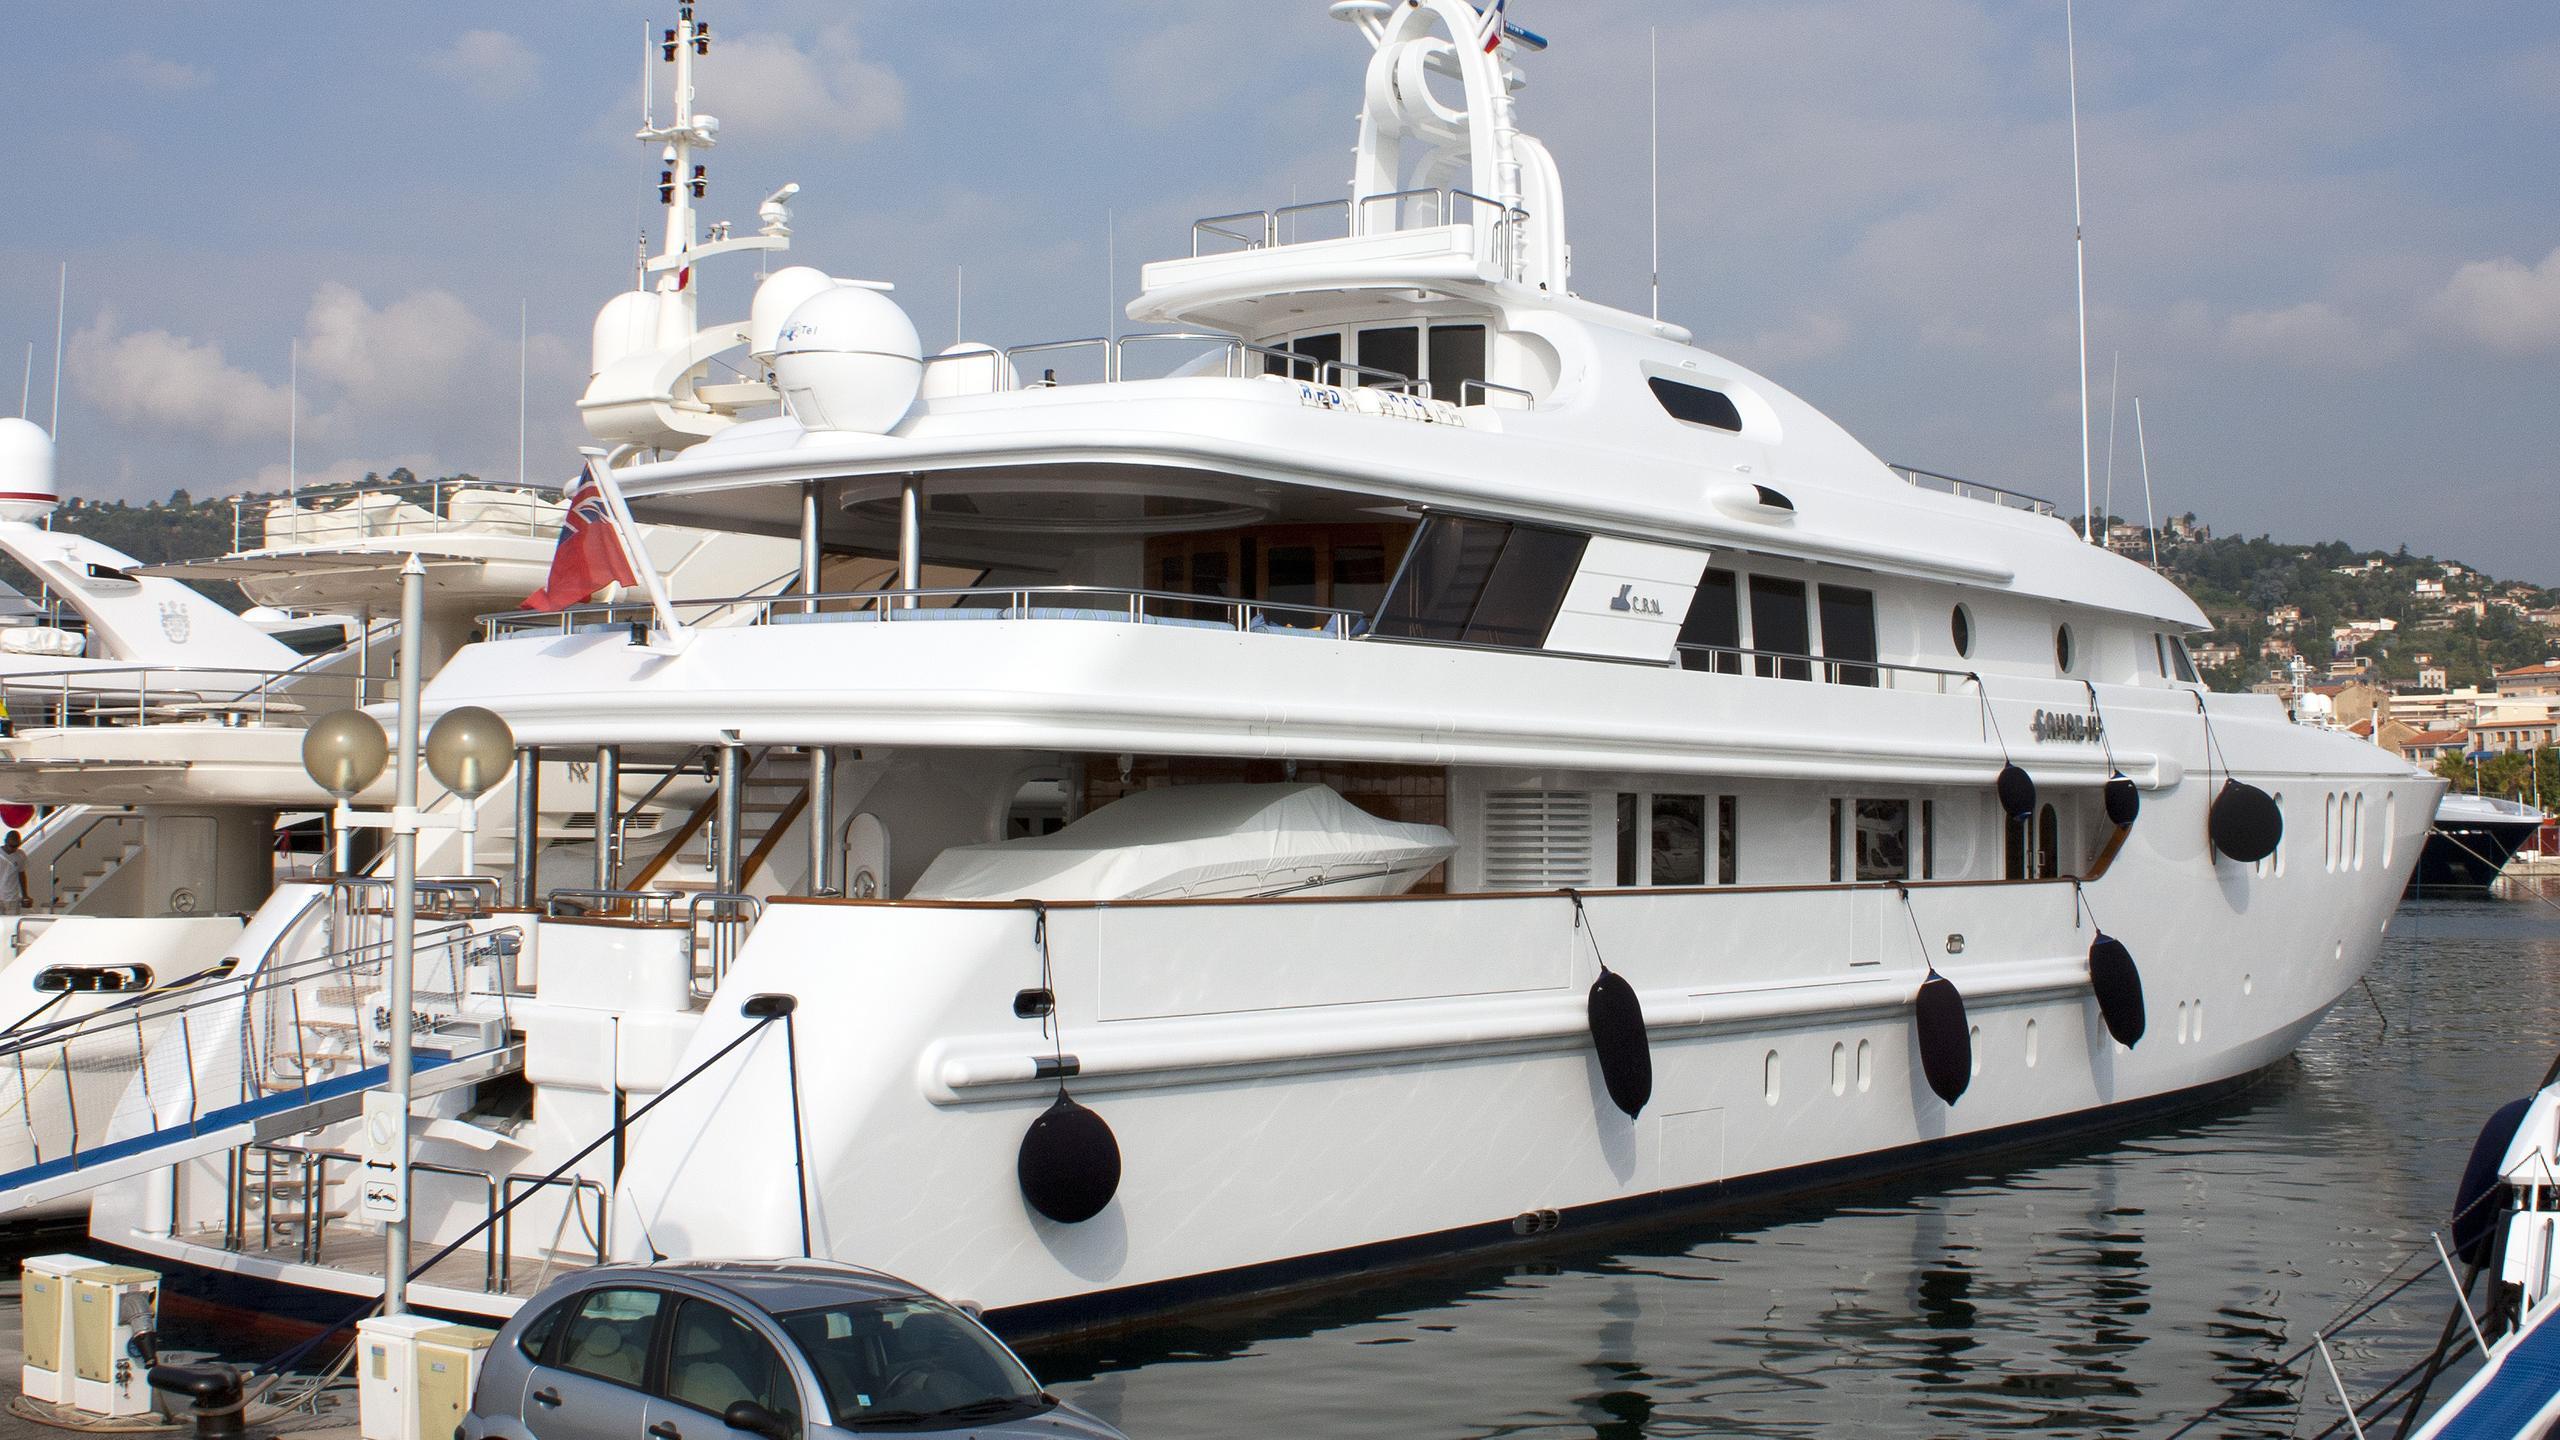 saha-iv-motor-yacht-crn-1997-50m-half-profile